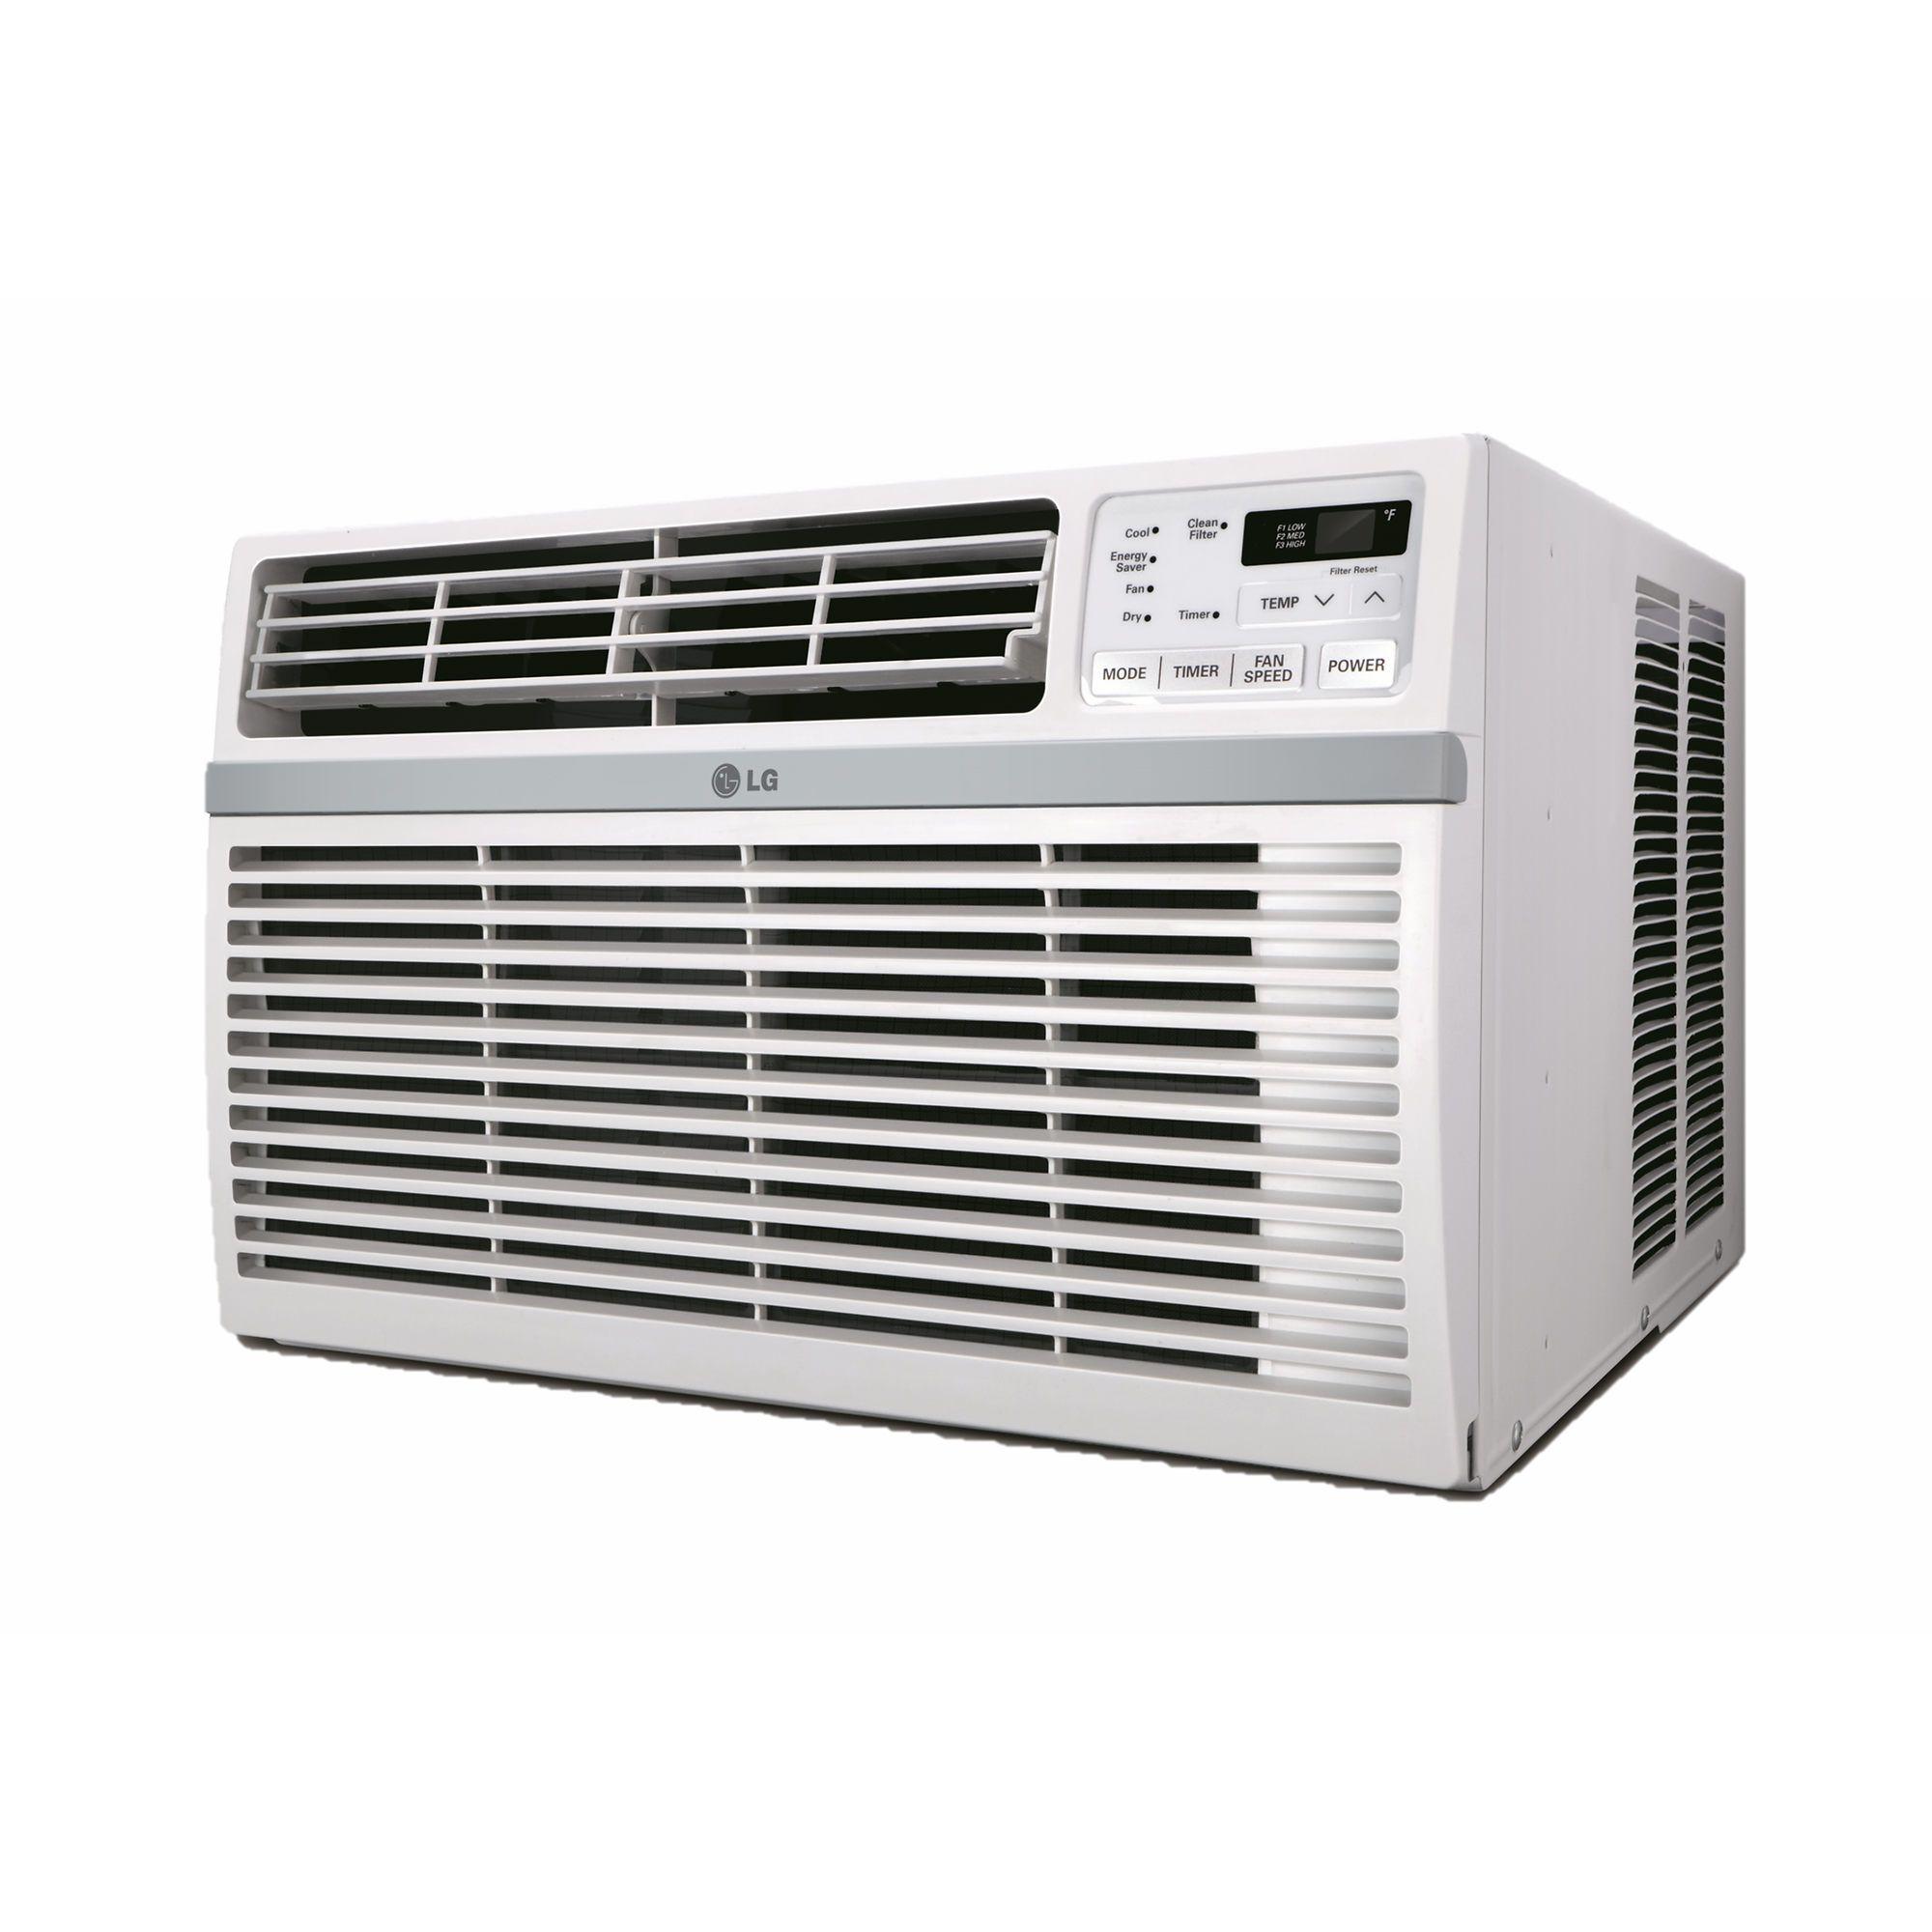 LG 8000 BTU Window Air Conditioner 180 in store (200 w